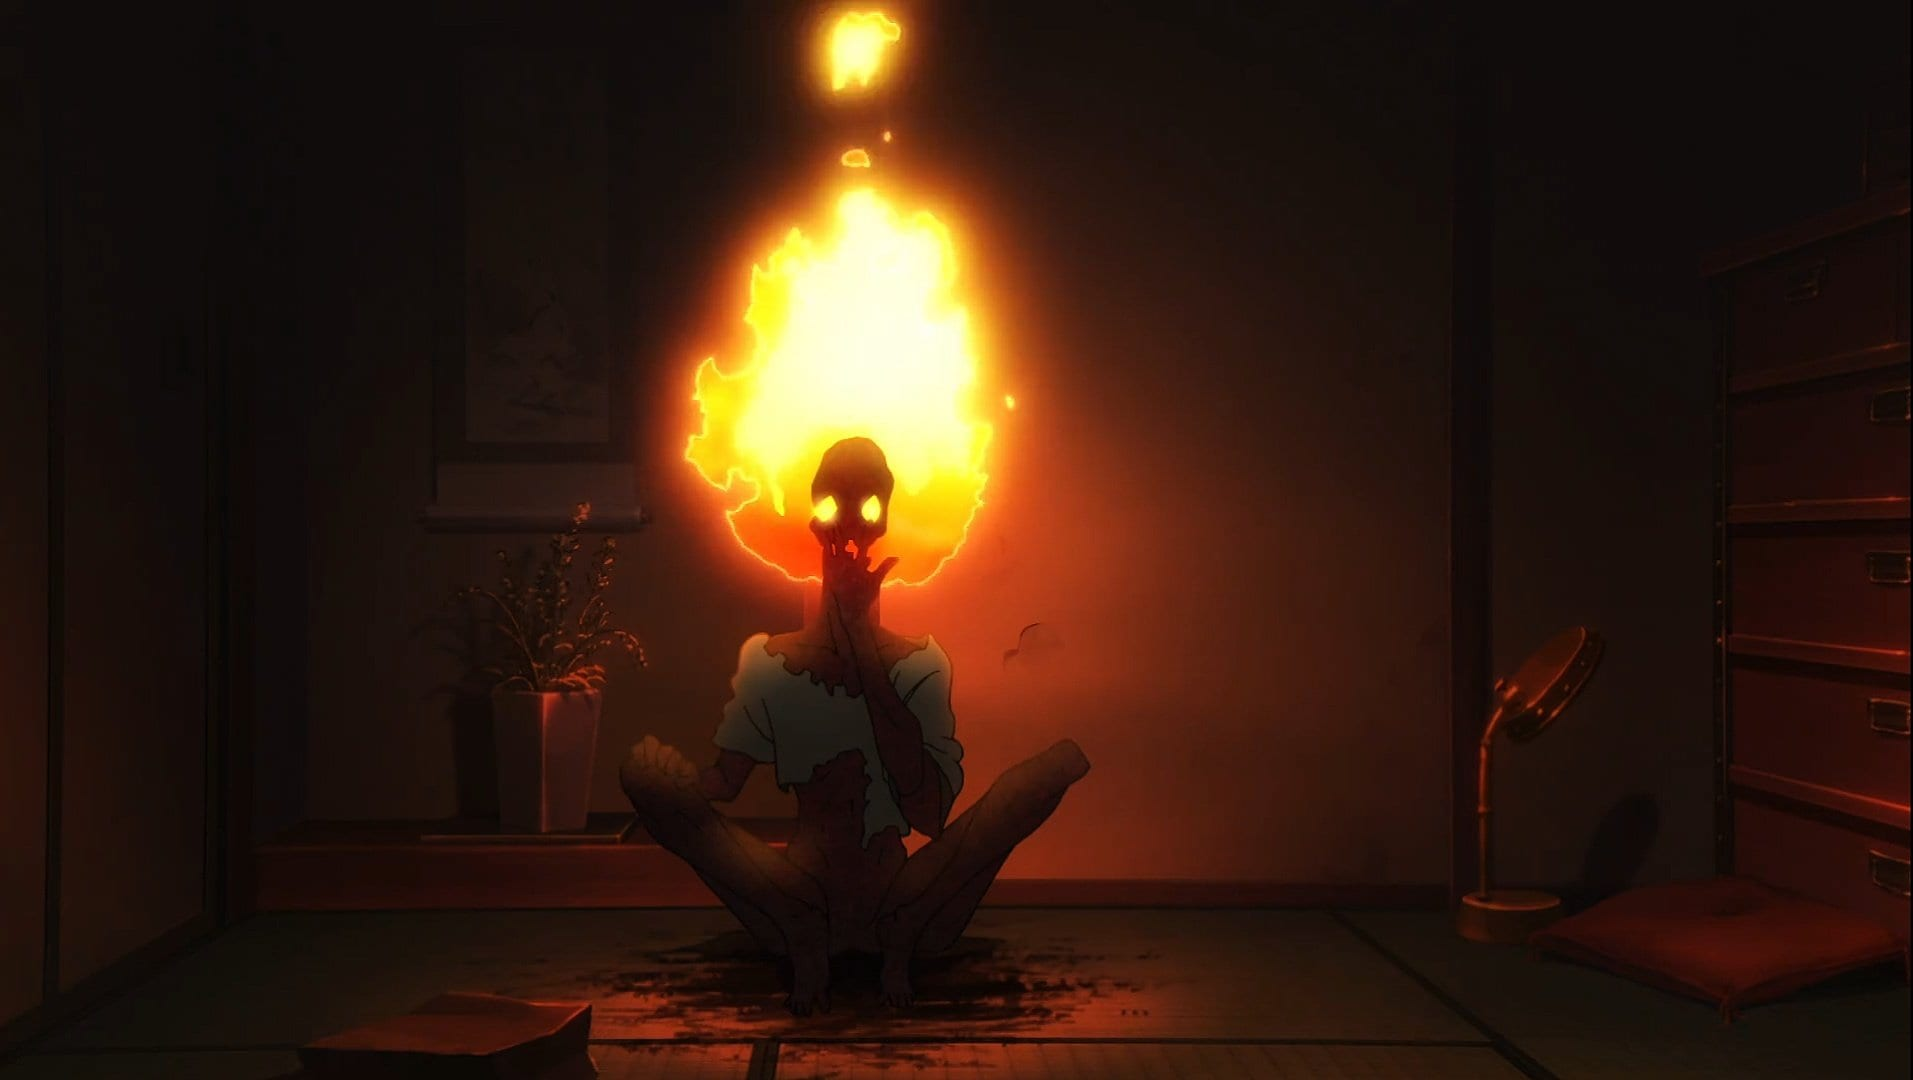 Fire Force Episode 12 update